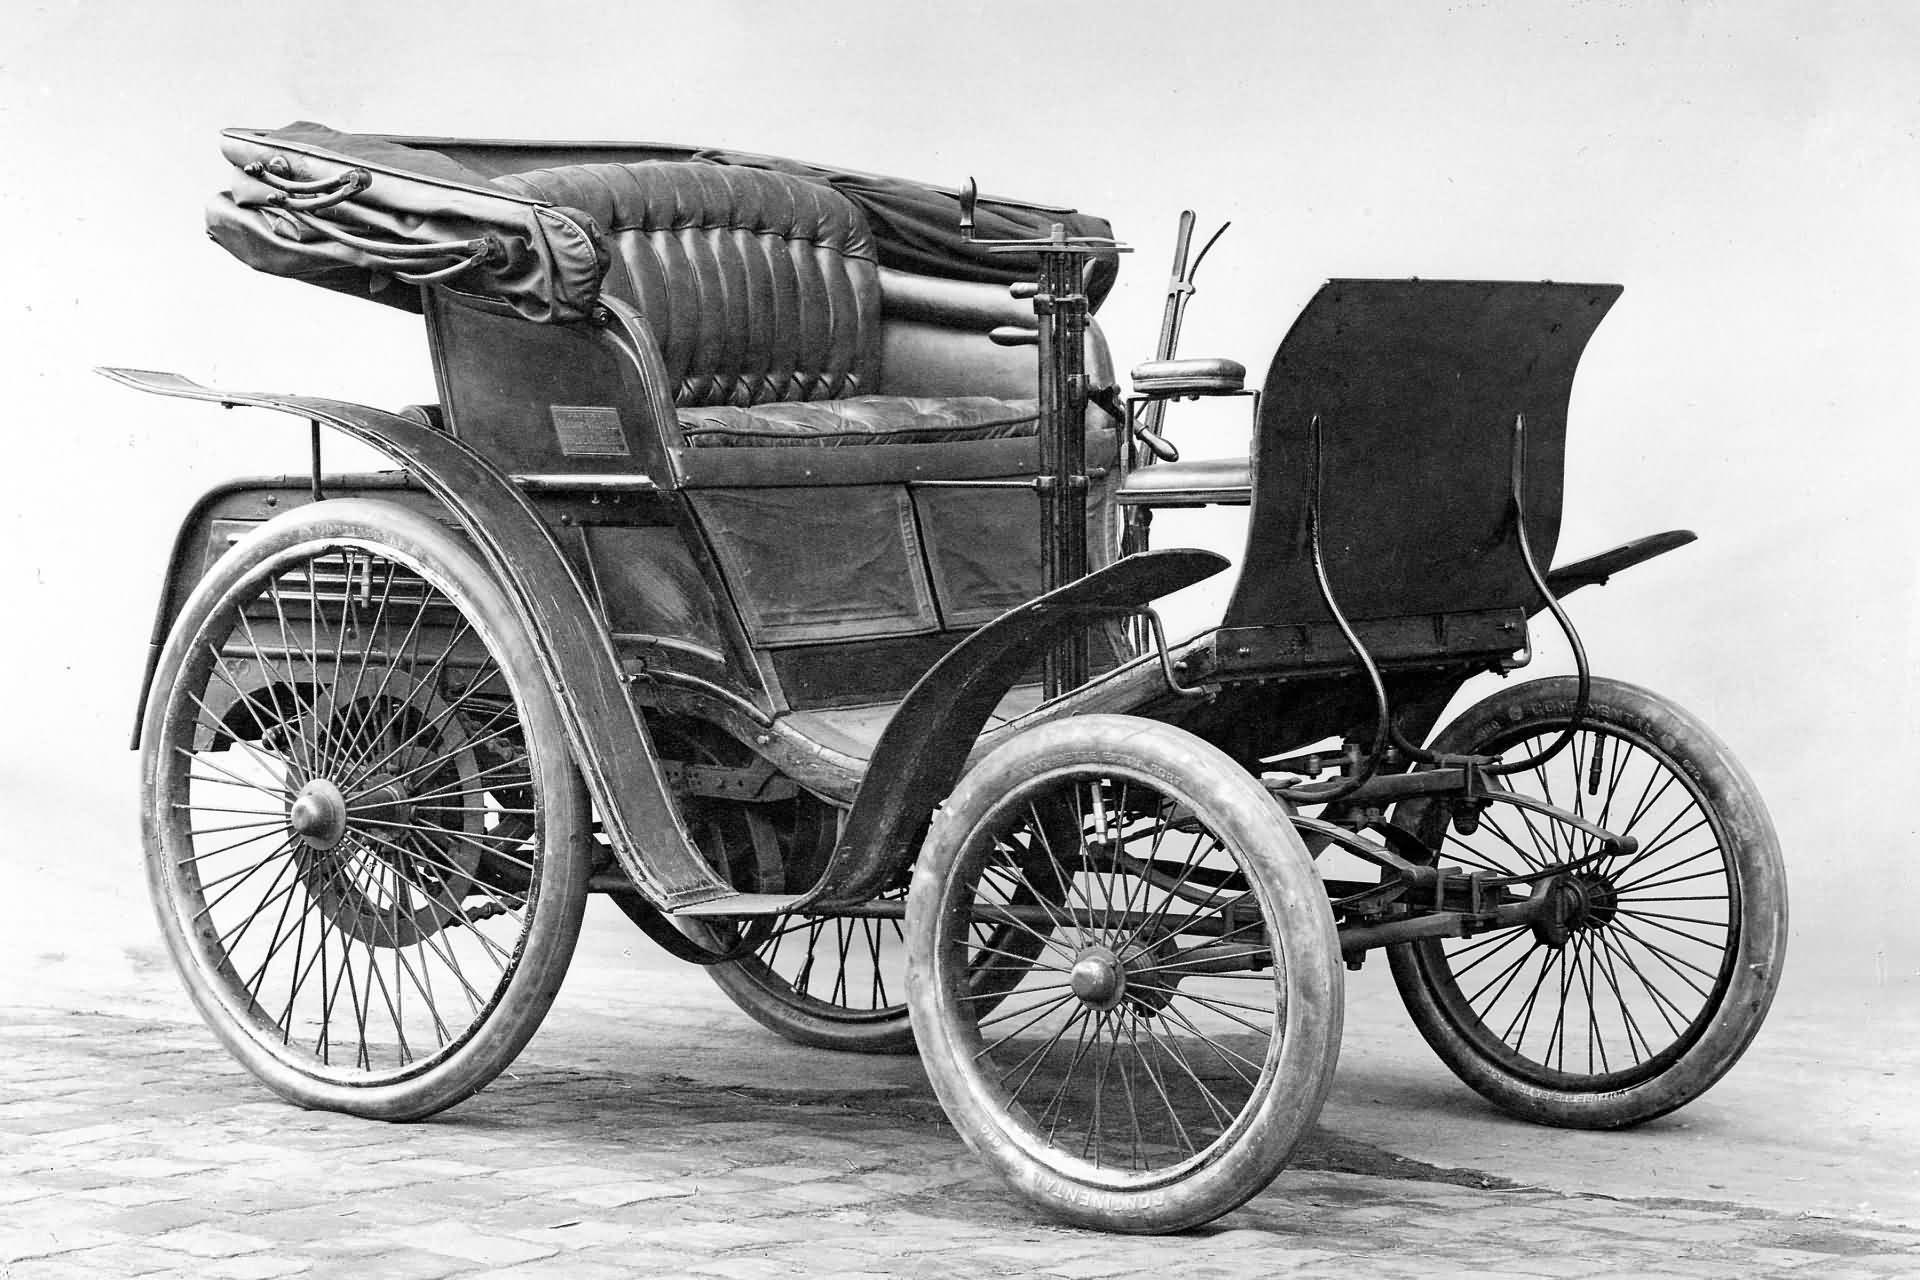 Benz Patent-Motorwagen Velociped